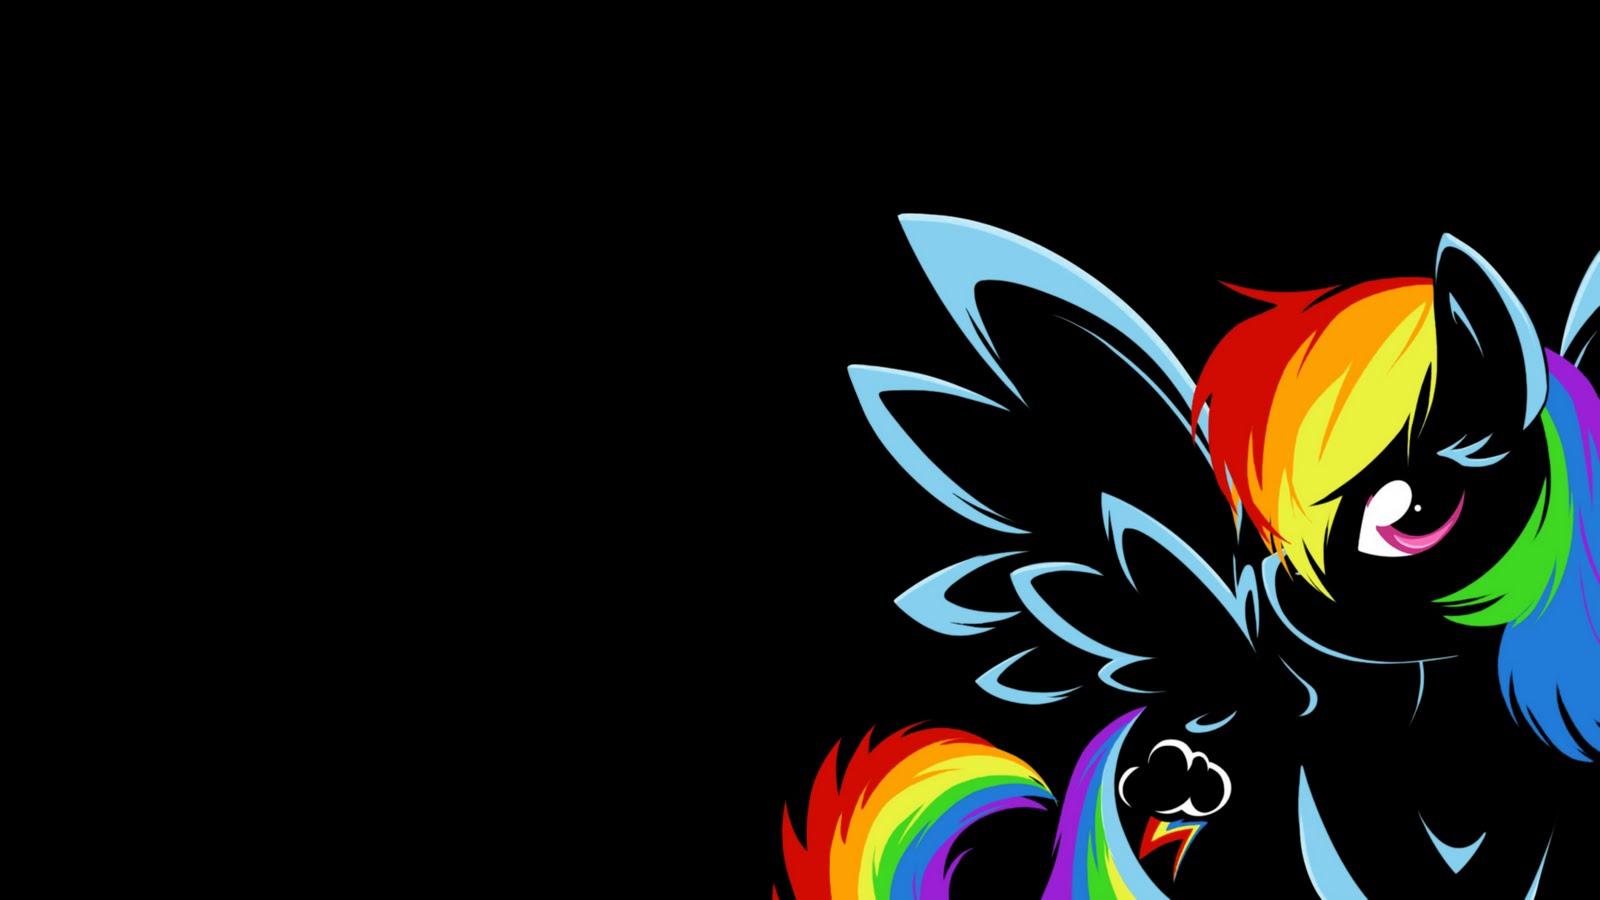 http://3.bp.blogspot.com/-tVrBqC76_3U/TehCR2td5GI/AAAAAAAAAd0/ZtFePg2sc5c/s1600/rainbow_dash_background_by_braukoly-d3hv8fm.jpg